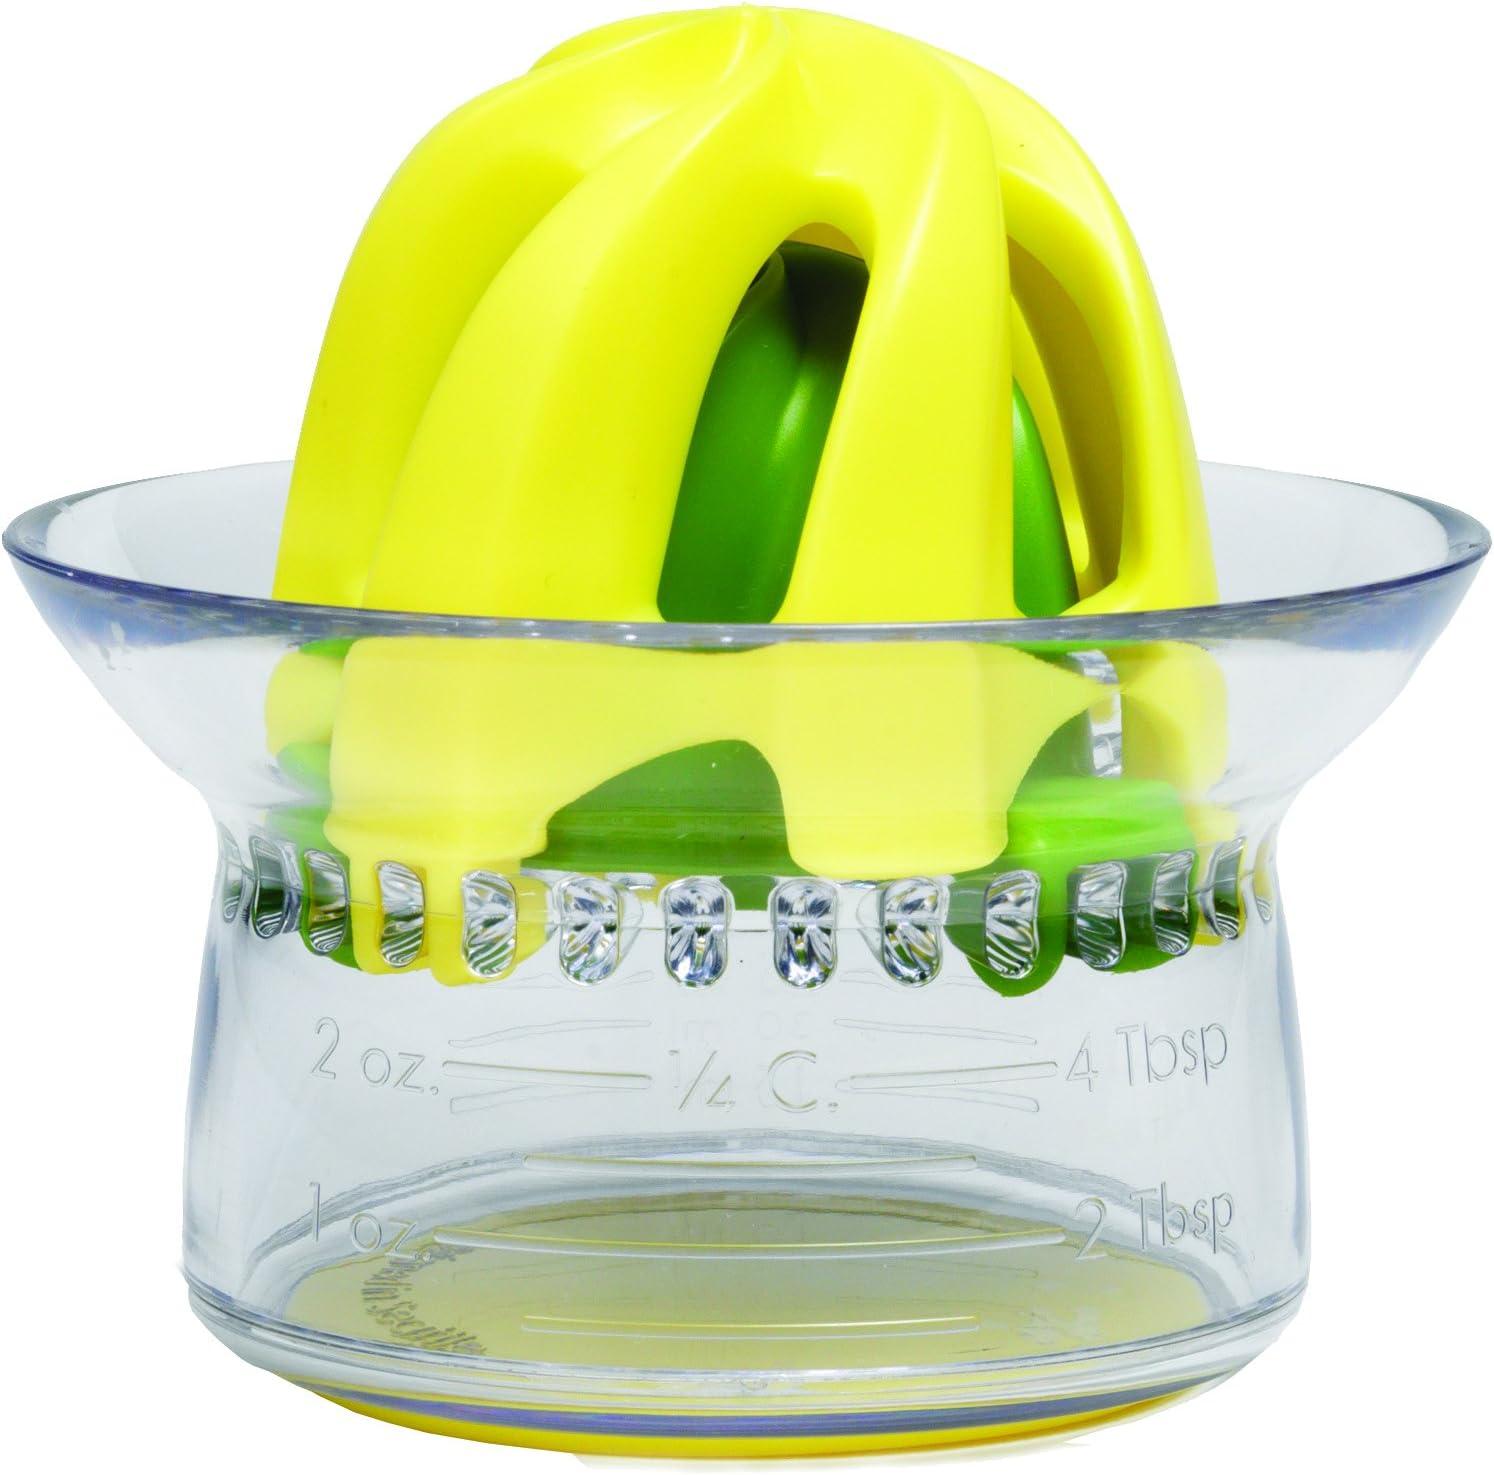 "Chefn 27470""Juicester Junior"" 2-in-1 Citrus Juicer, Transparent/Yellow/Green"